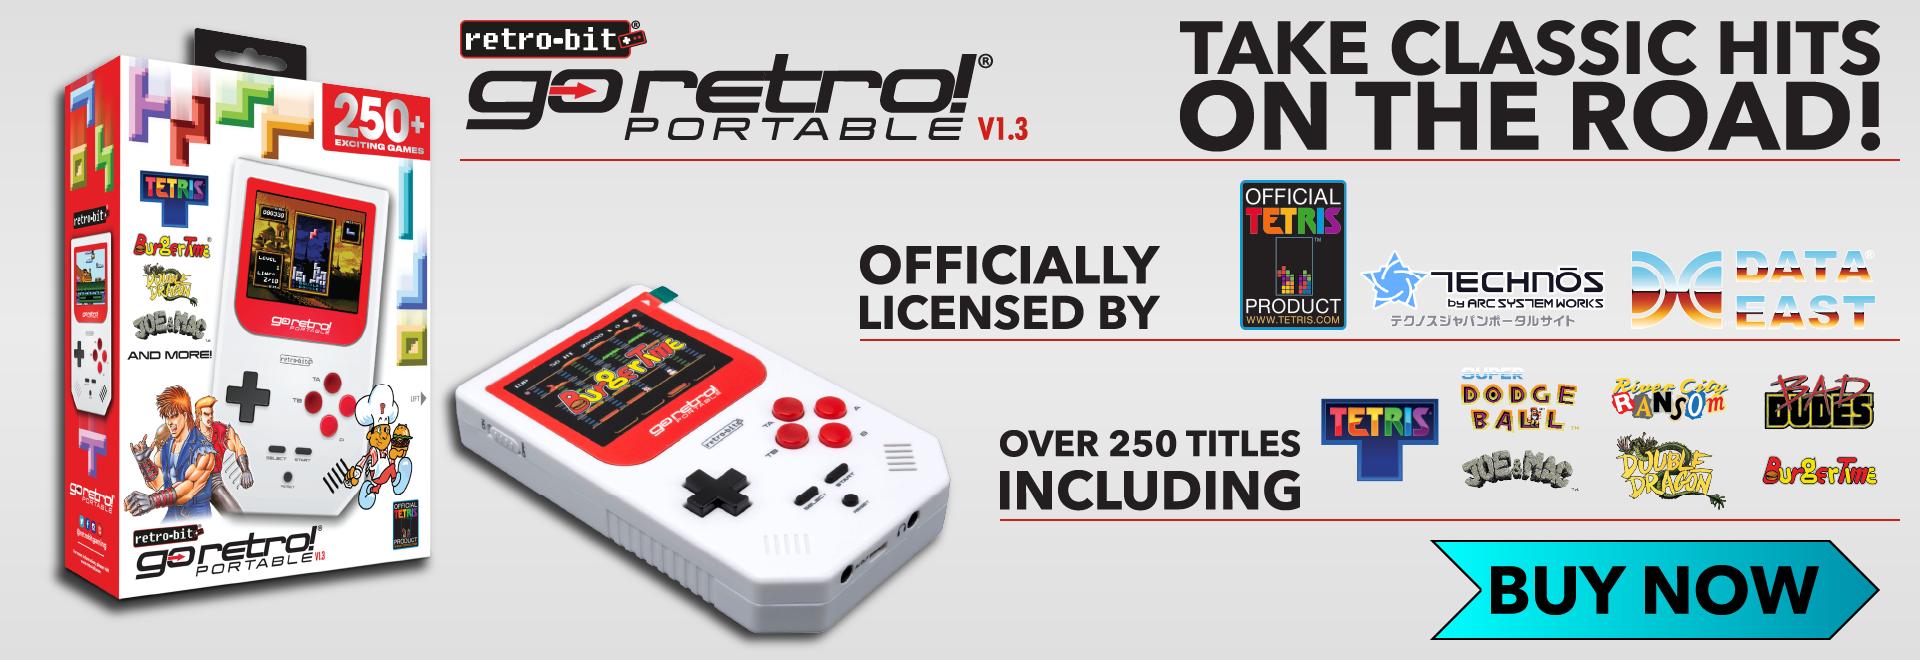 GoRetro Portable v1.3 - Buy Now